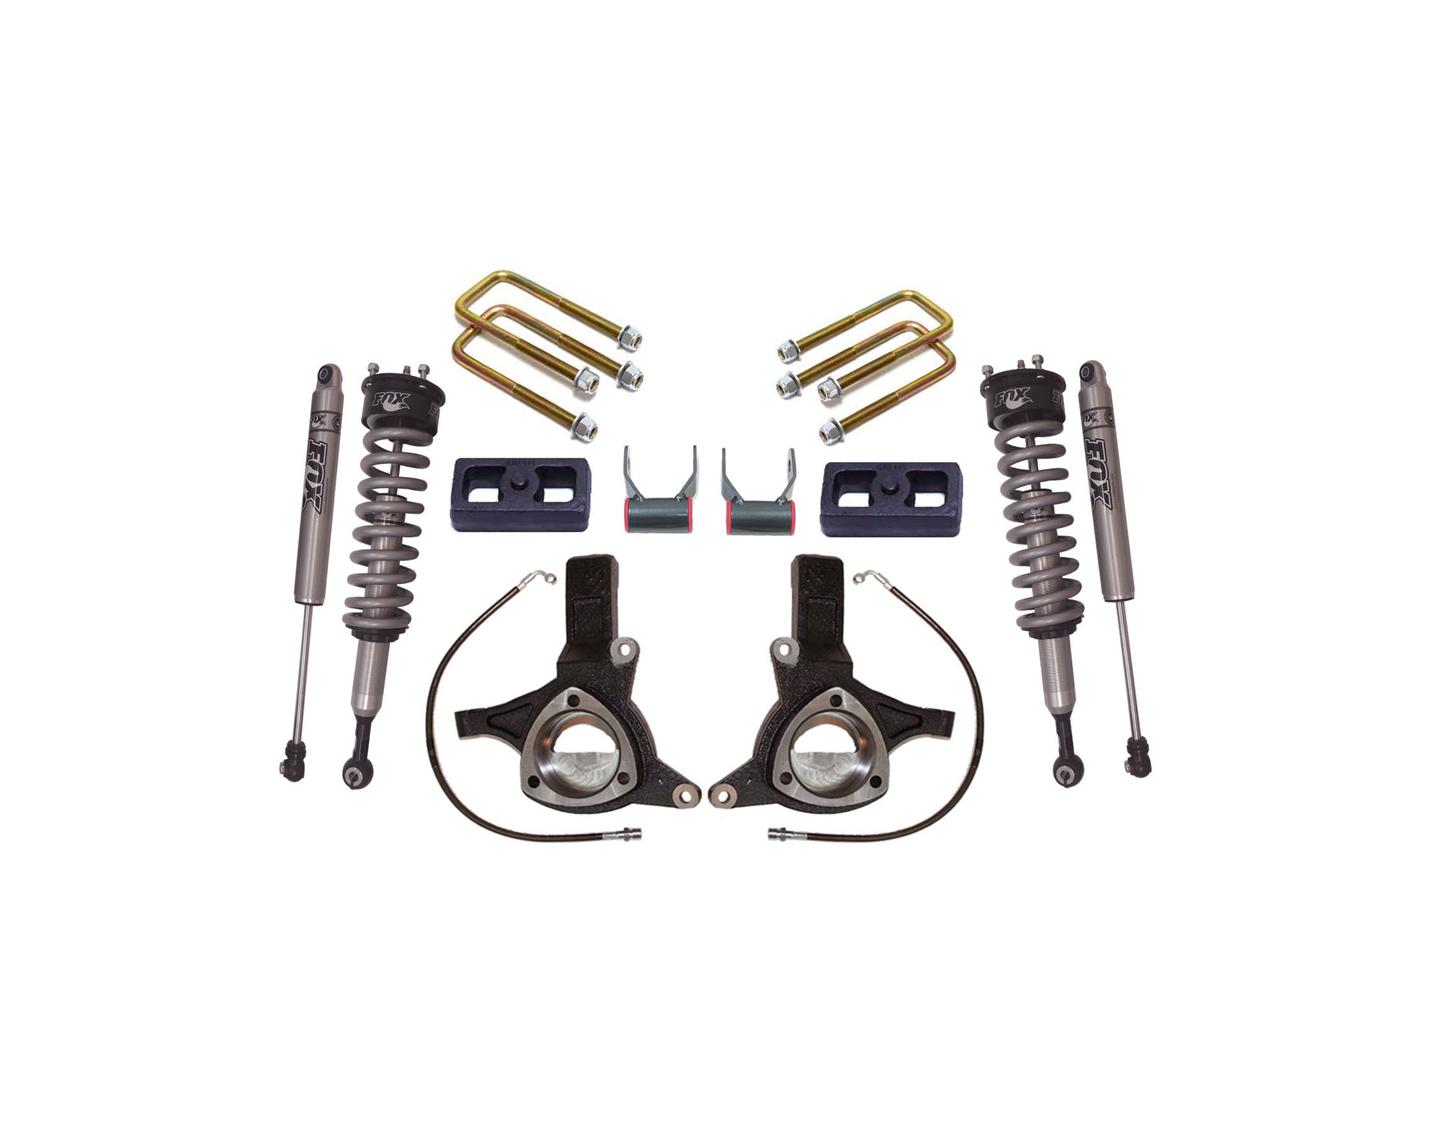 16 Gm Silverado 2wd 7 Lift Kit W Fox Shocks